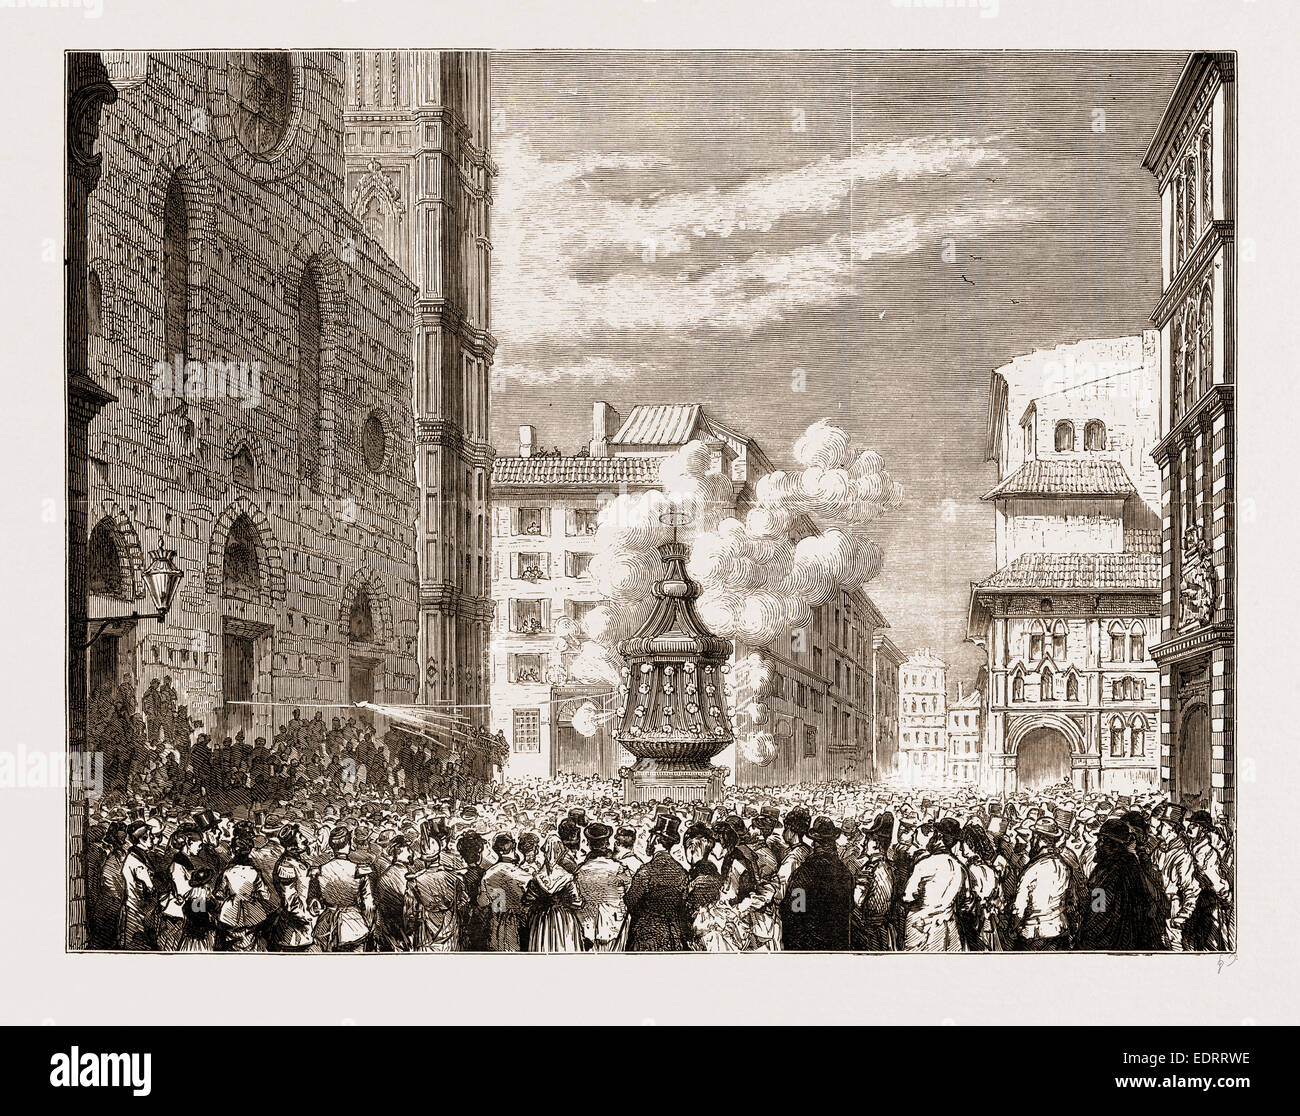 EASTERTIDE CEREMONIES: 'LO SCOPPIO DEL CARRO' AT FLORENCE, ITALY, 1876 - Stock Image